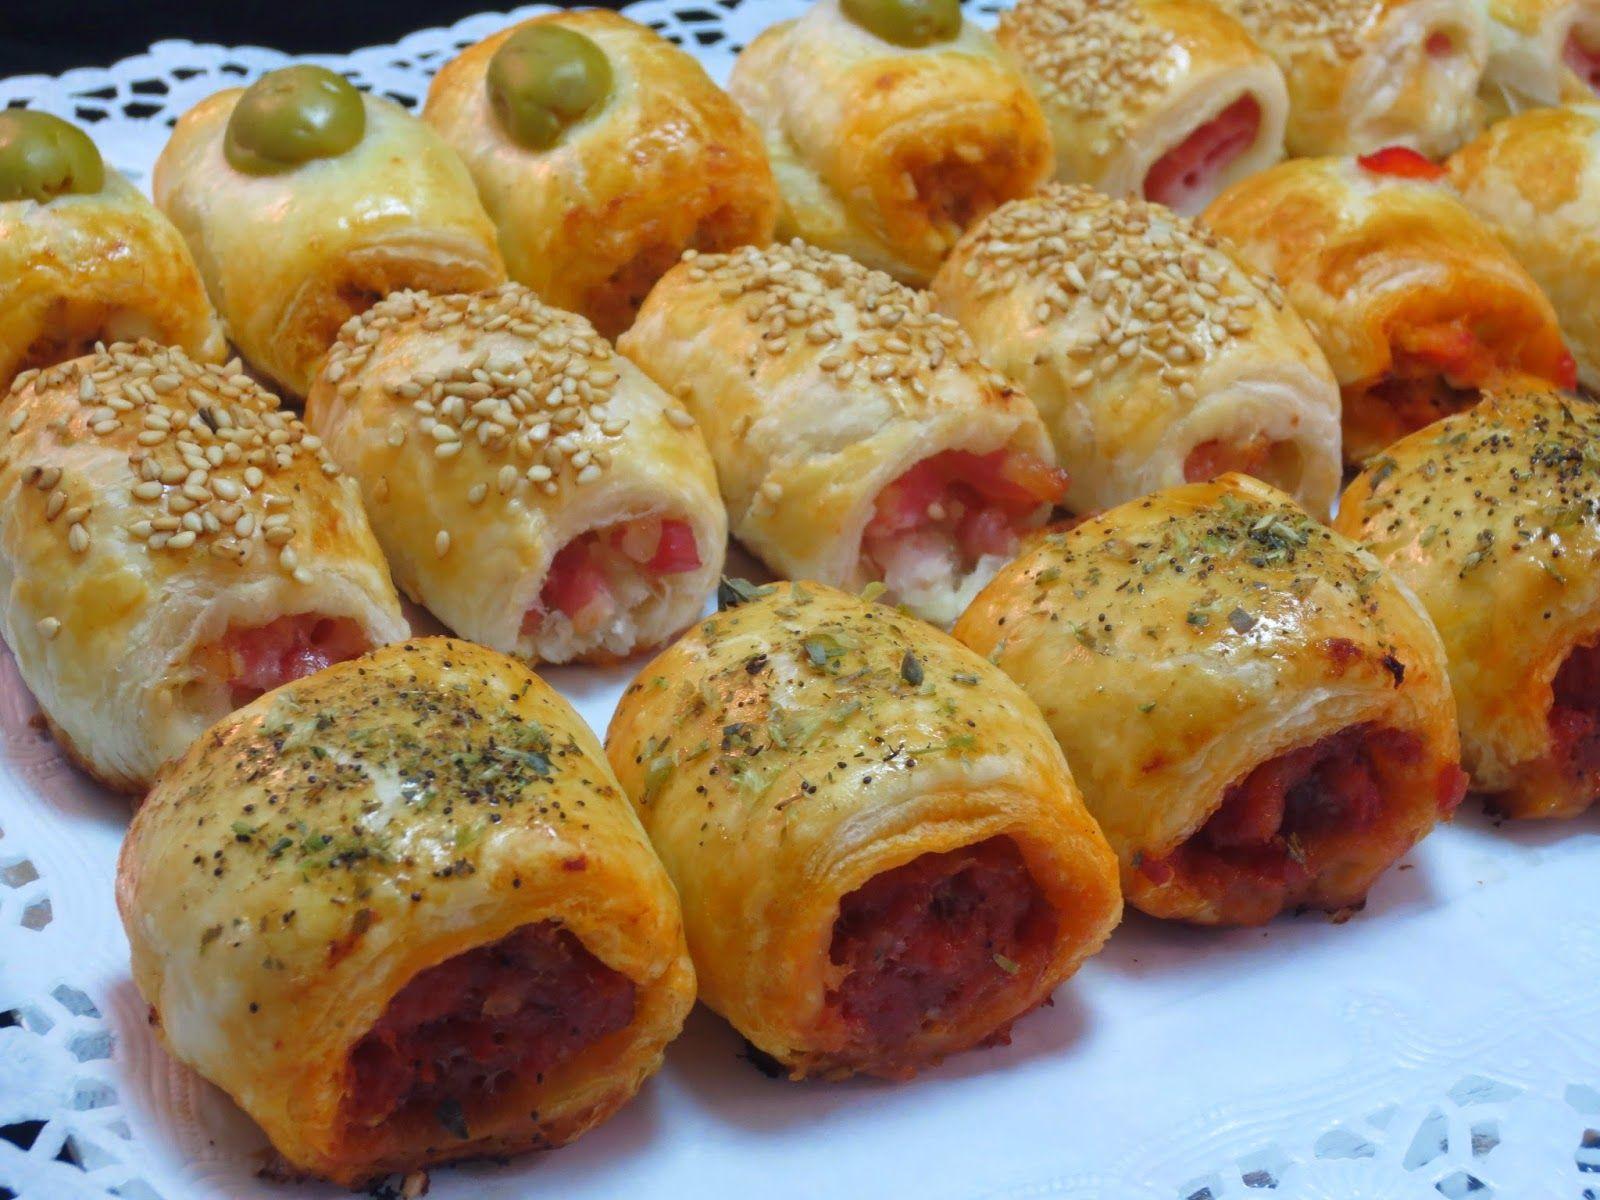 Blog con recetas sencillas r pidas y econ micas de thermomix realizadas por ana sevilla comidas - Ana cocina facil ...